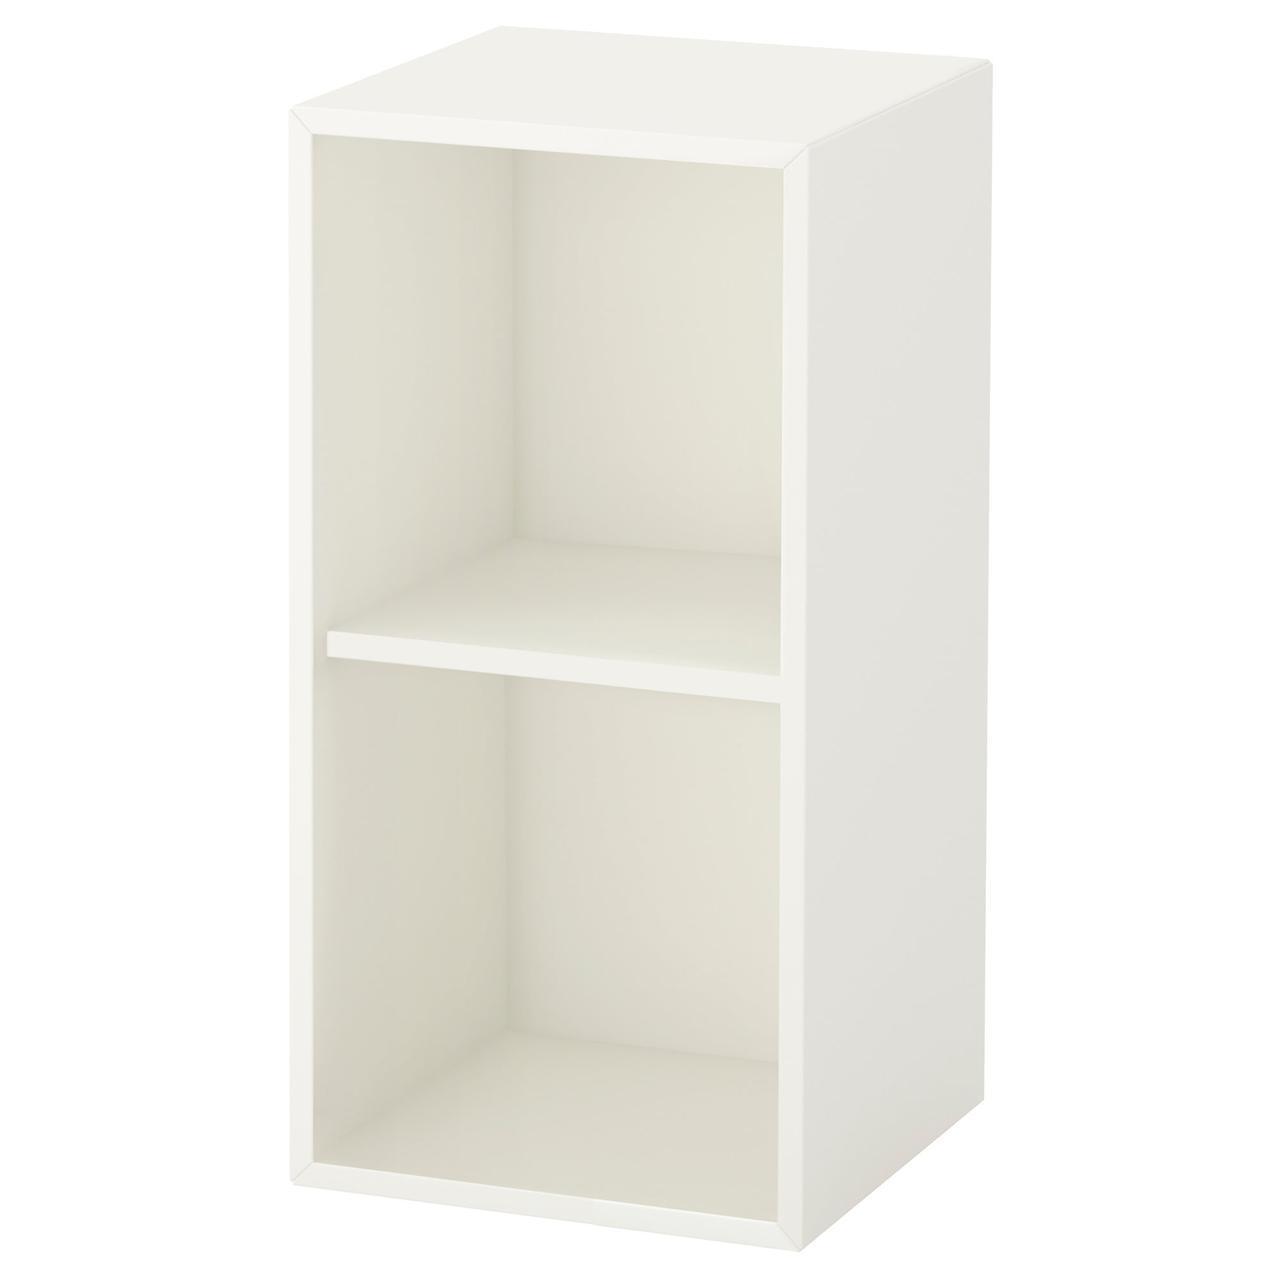 IKEA EKET (203.321.26) Шкаф с 2 отсеками